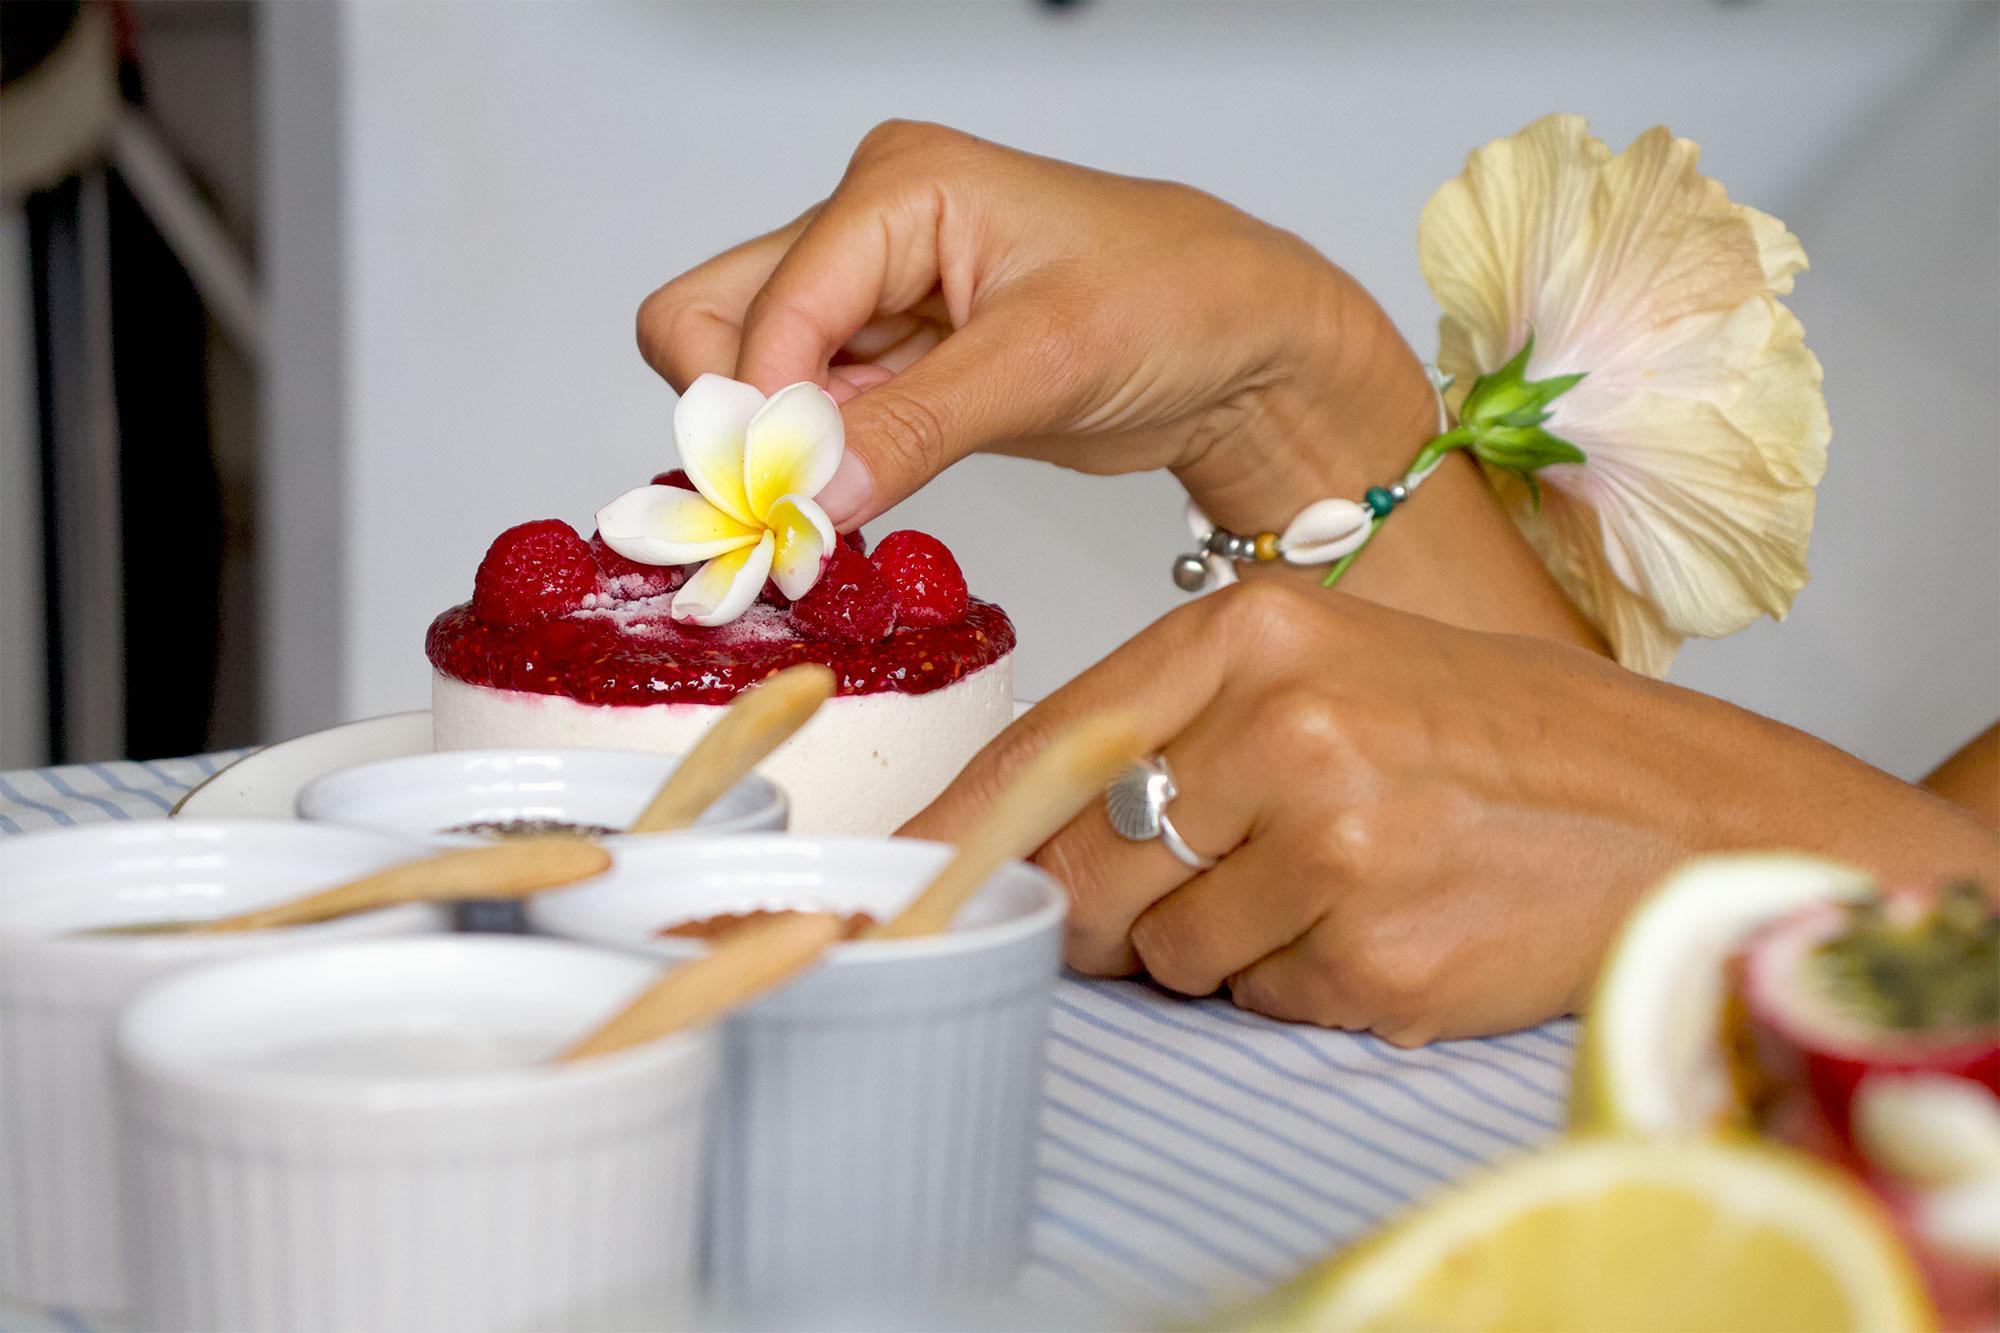 ingredientes-vegan-only-sweet-2.jpg